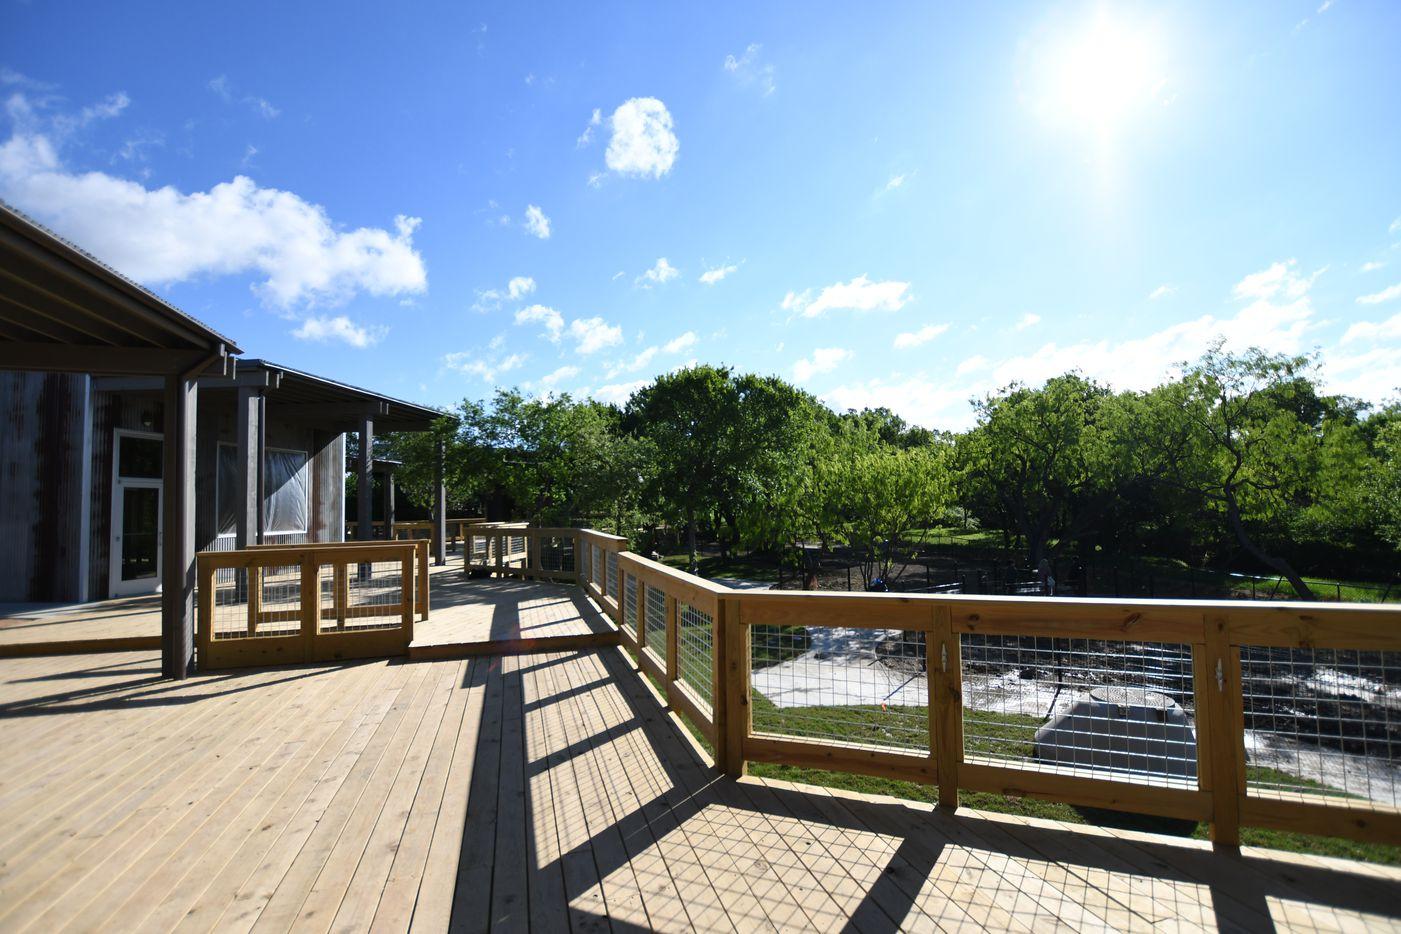 The Shacks restaurants have decks overlooking a greenbelt and creek.